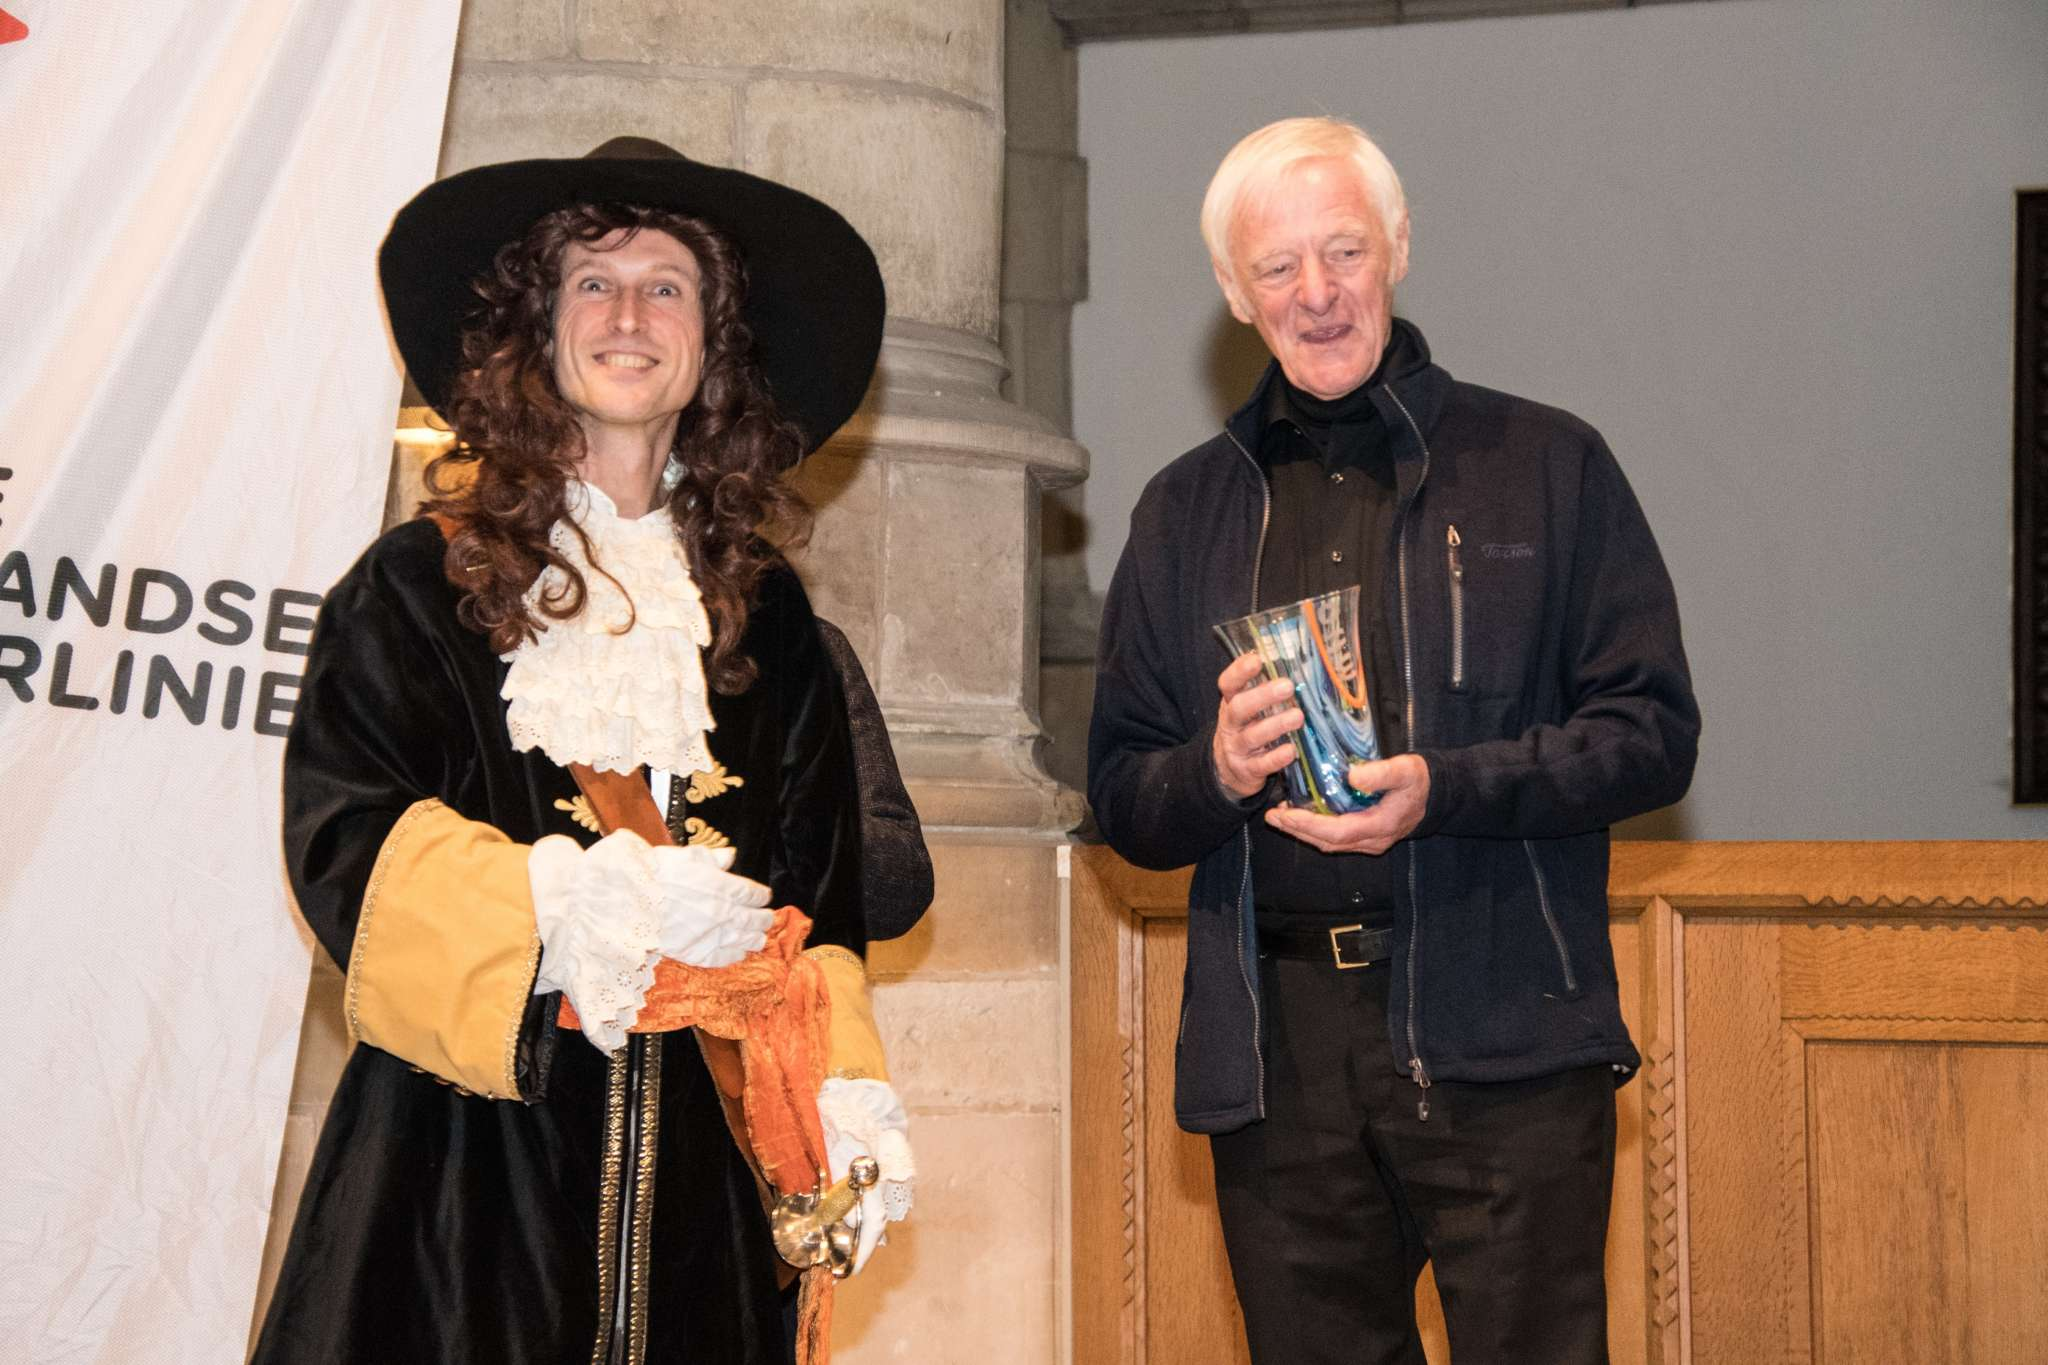 Waterlinieprijs Voor Vestingwerkgroep Gorinchem